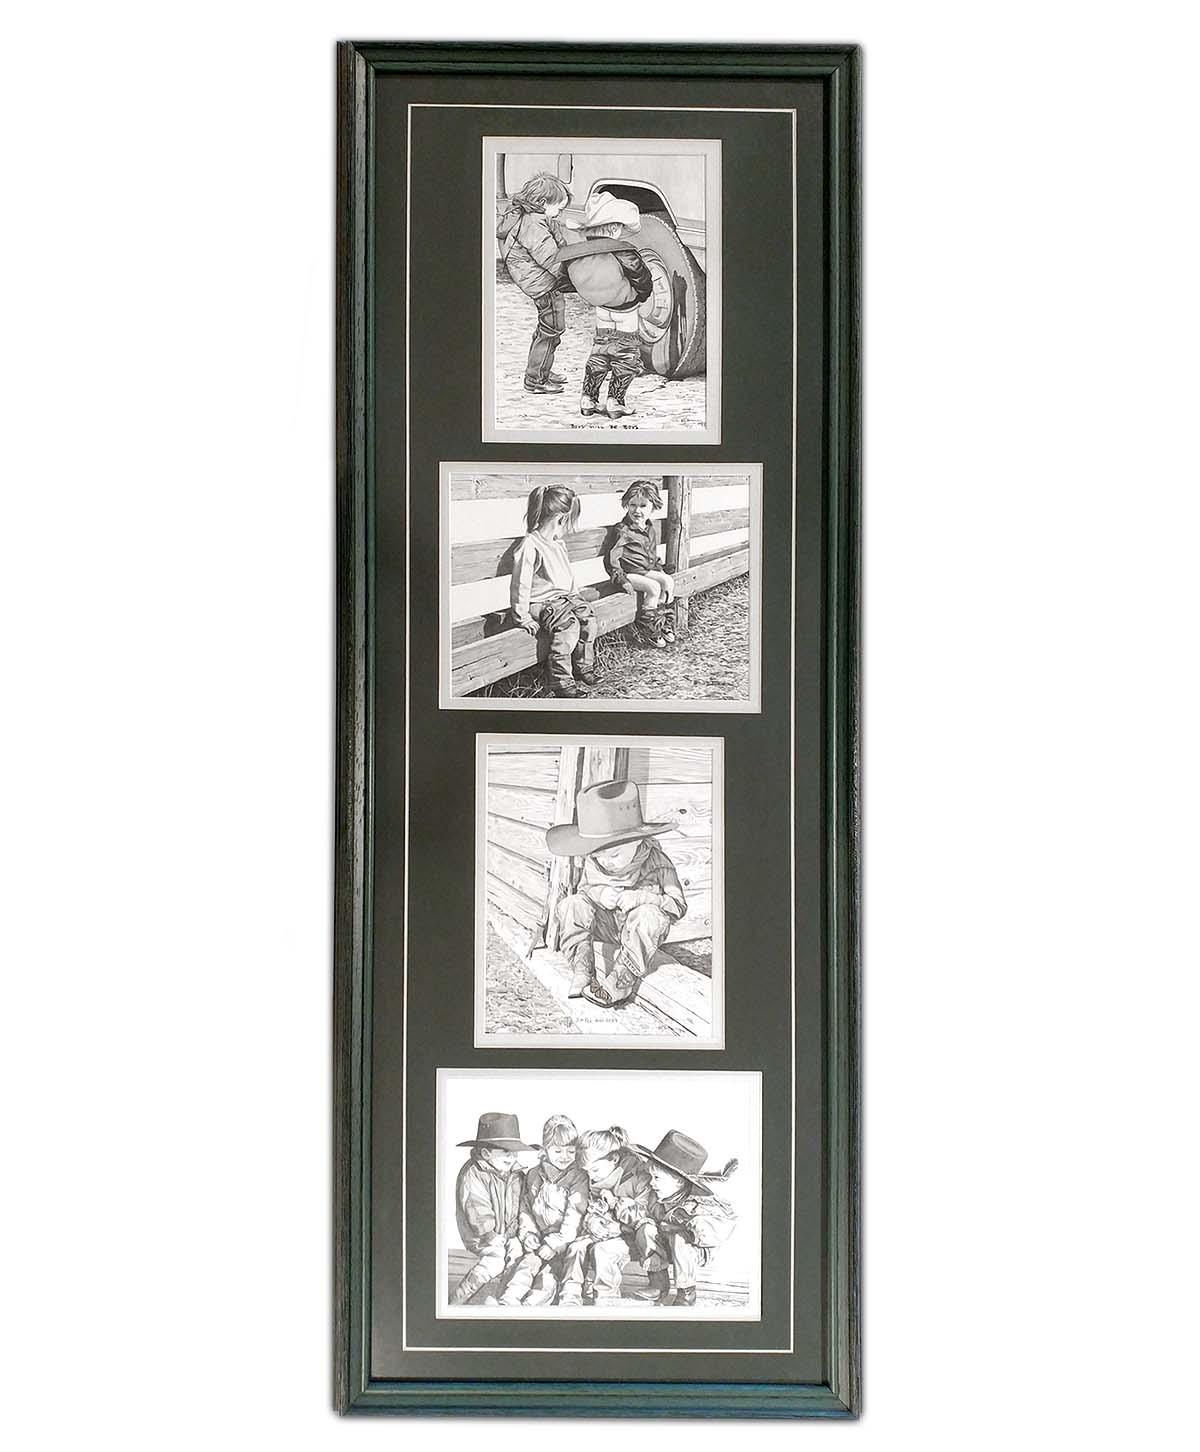 Set of 4 Framed Black and White Prints of Children - Bernie Brown